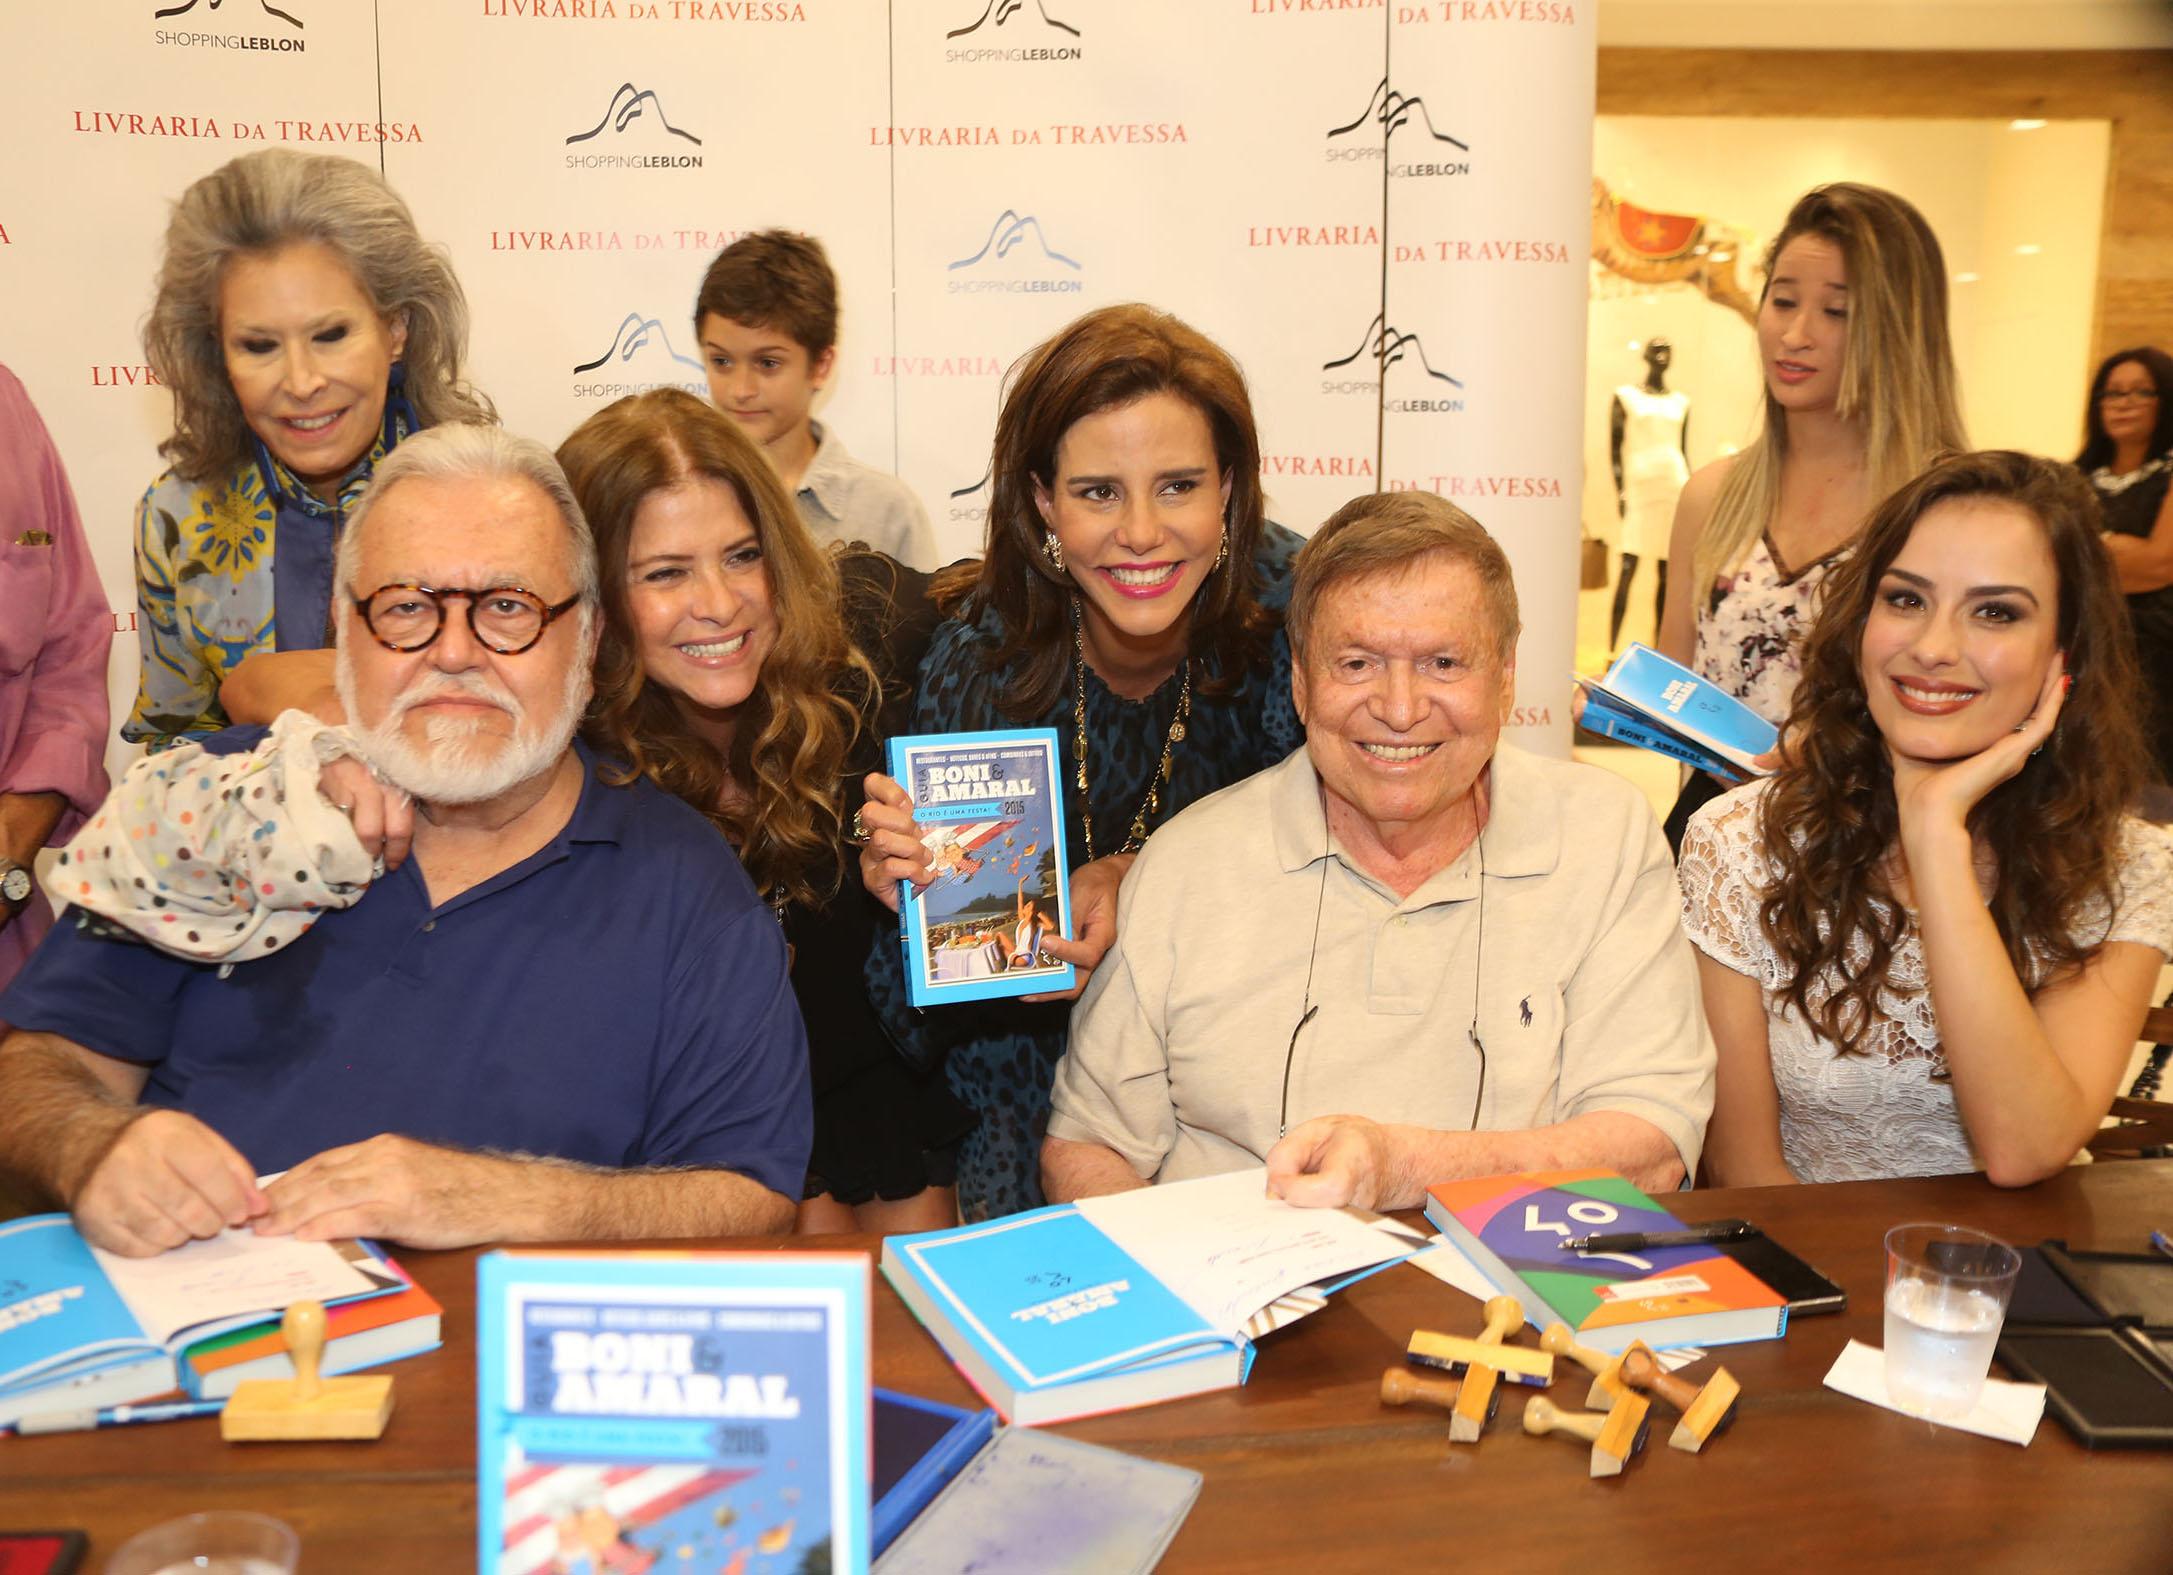 Jos_-Hugo-Celid_nio-Gisella-Ricardo-Amaral-Lu-Oliveira-Narcisa-Tambrorindeguy-Boni-Oliveira-e-Chef-Heaven-Delhaye